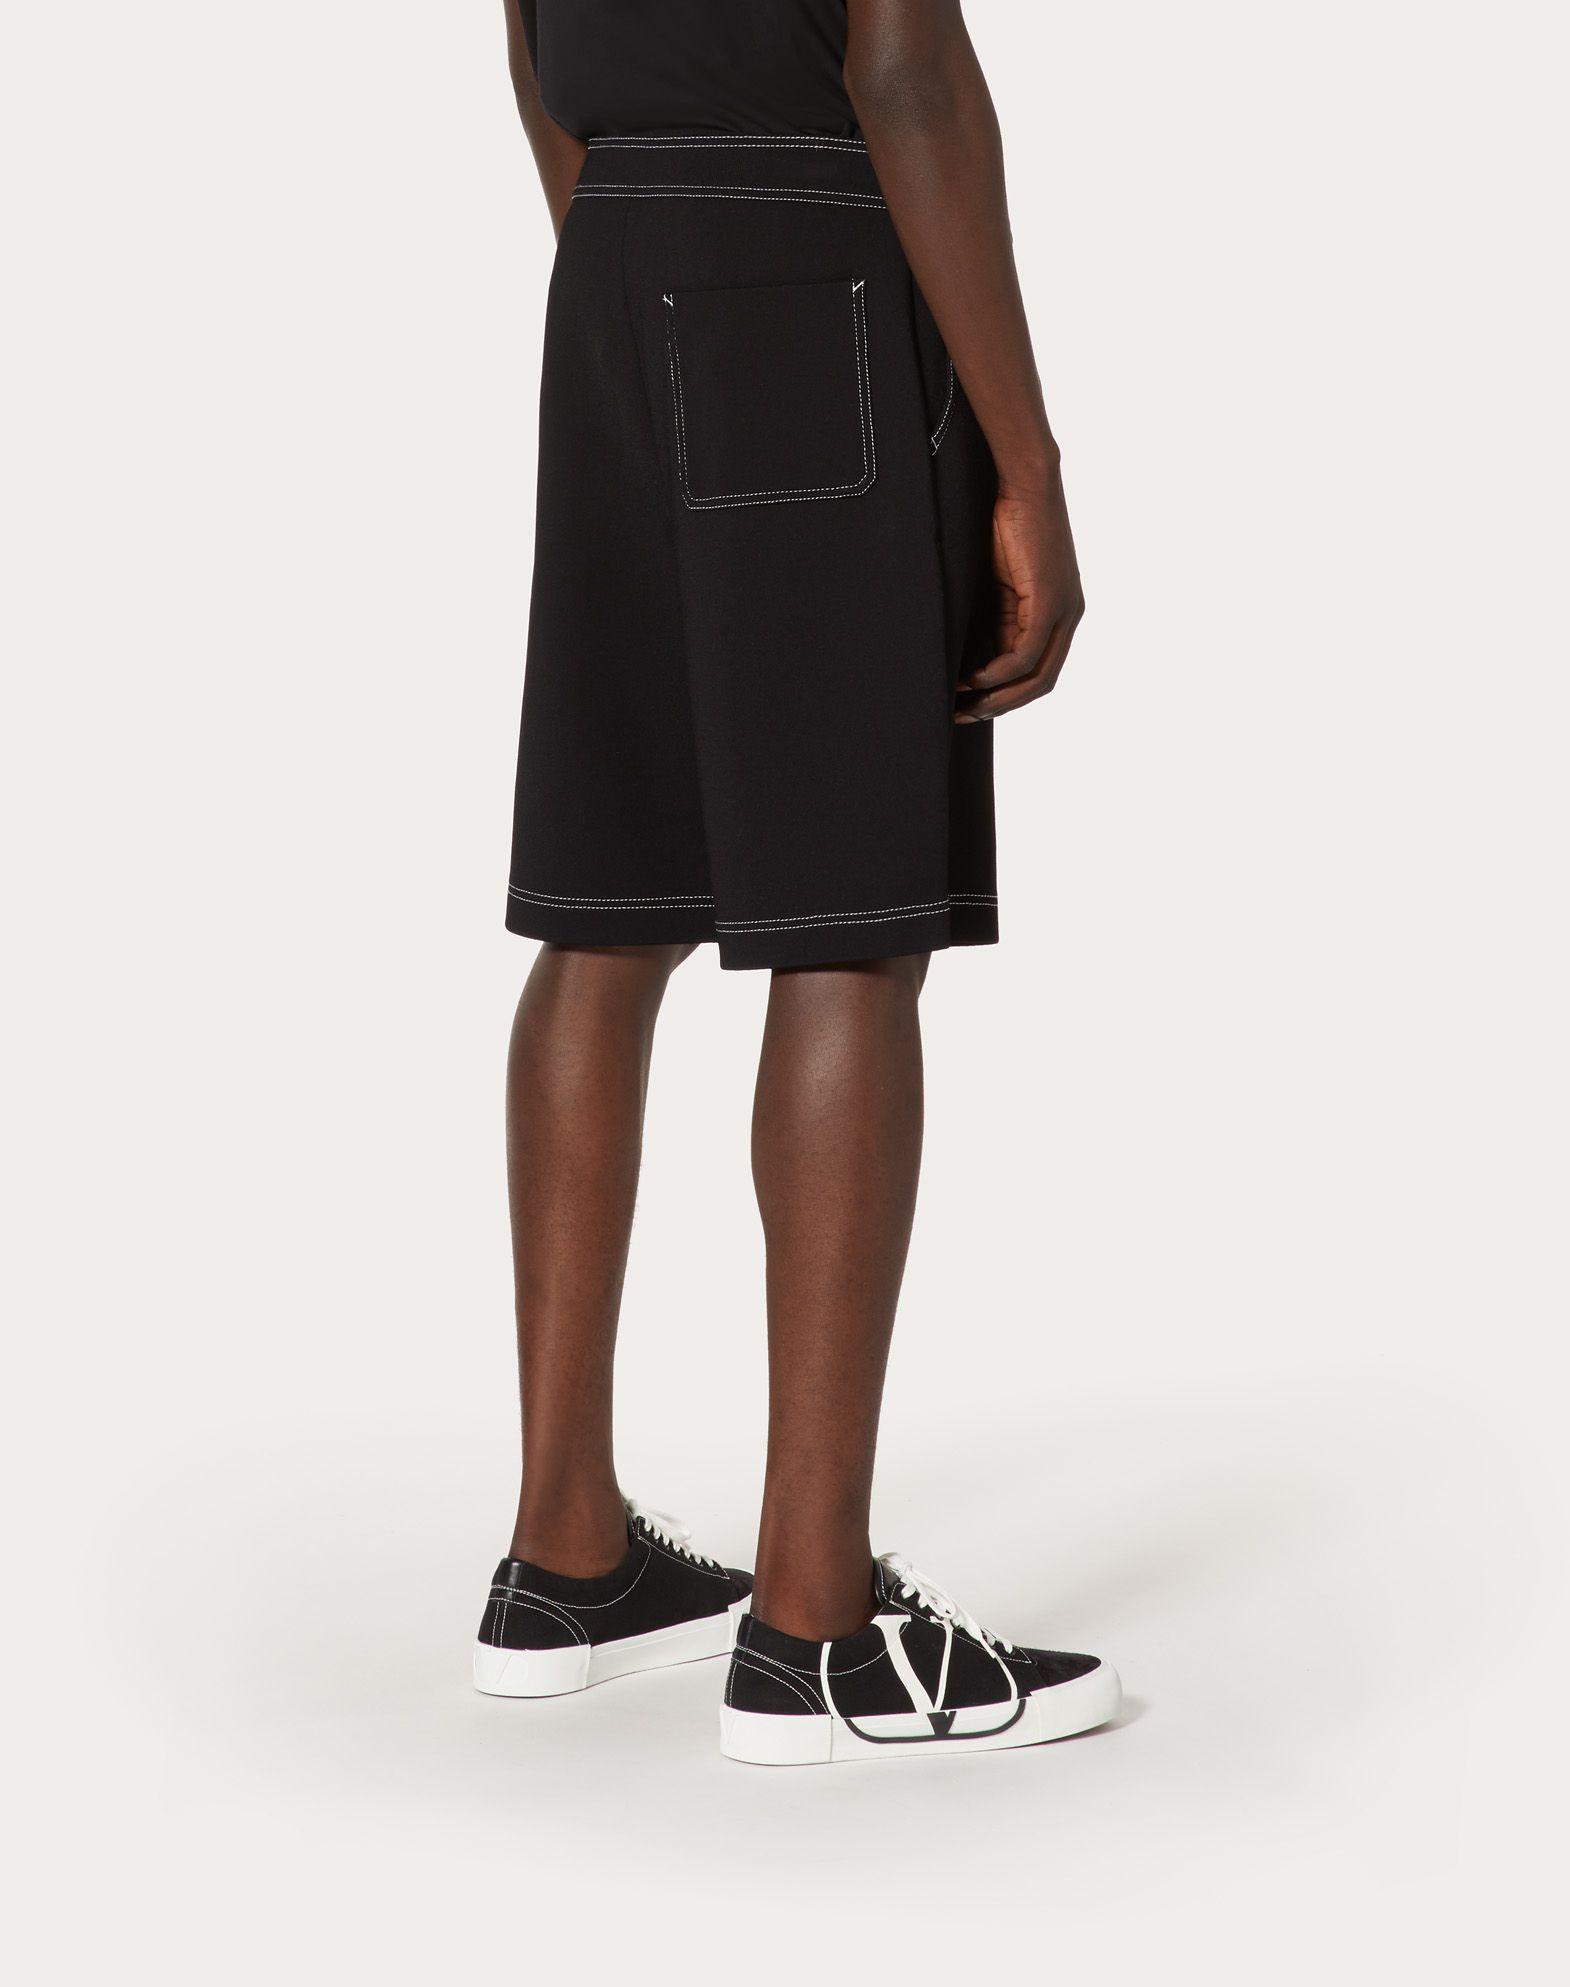 VALENTINO UOMO Cropped knit trousers with VLTN logo Shorts U e